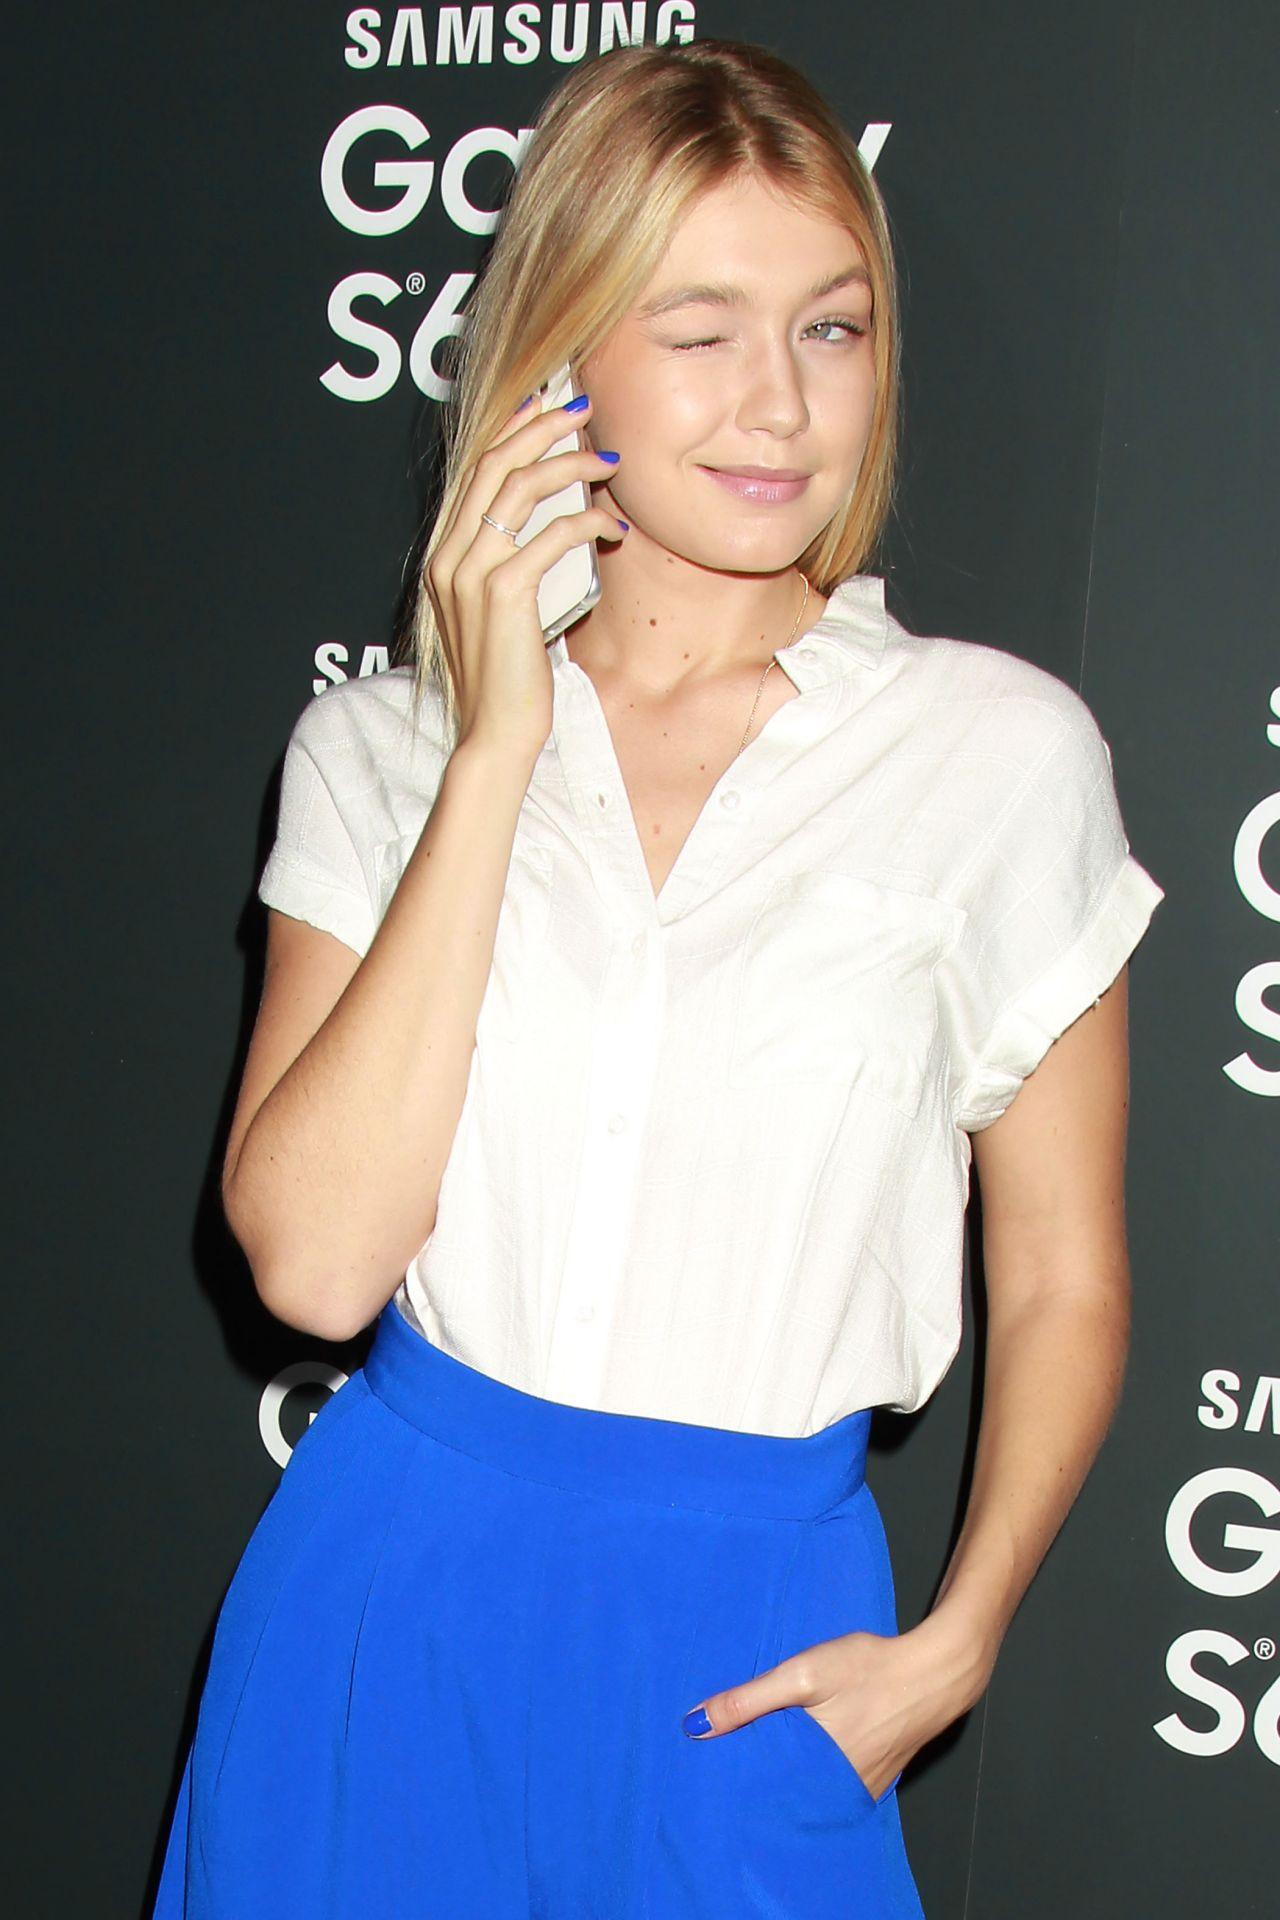 Gigi Hadid - Samsung Galaxy S6 and S6 Edge Launch in New York City